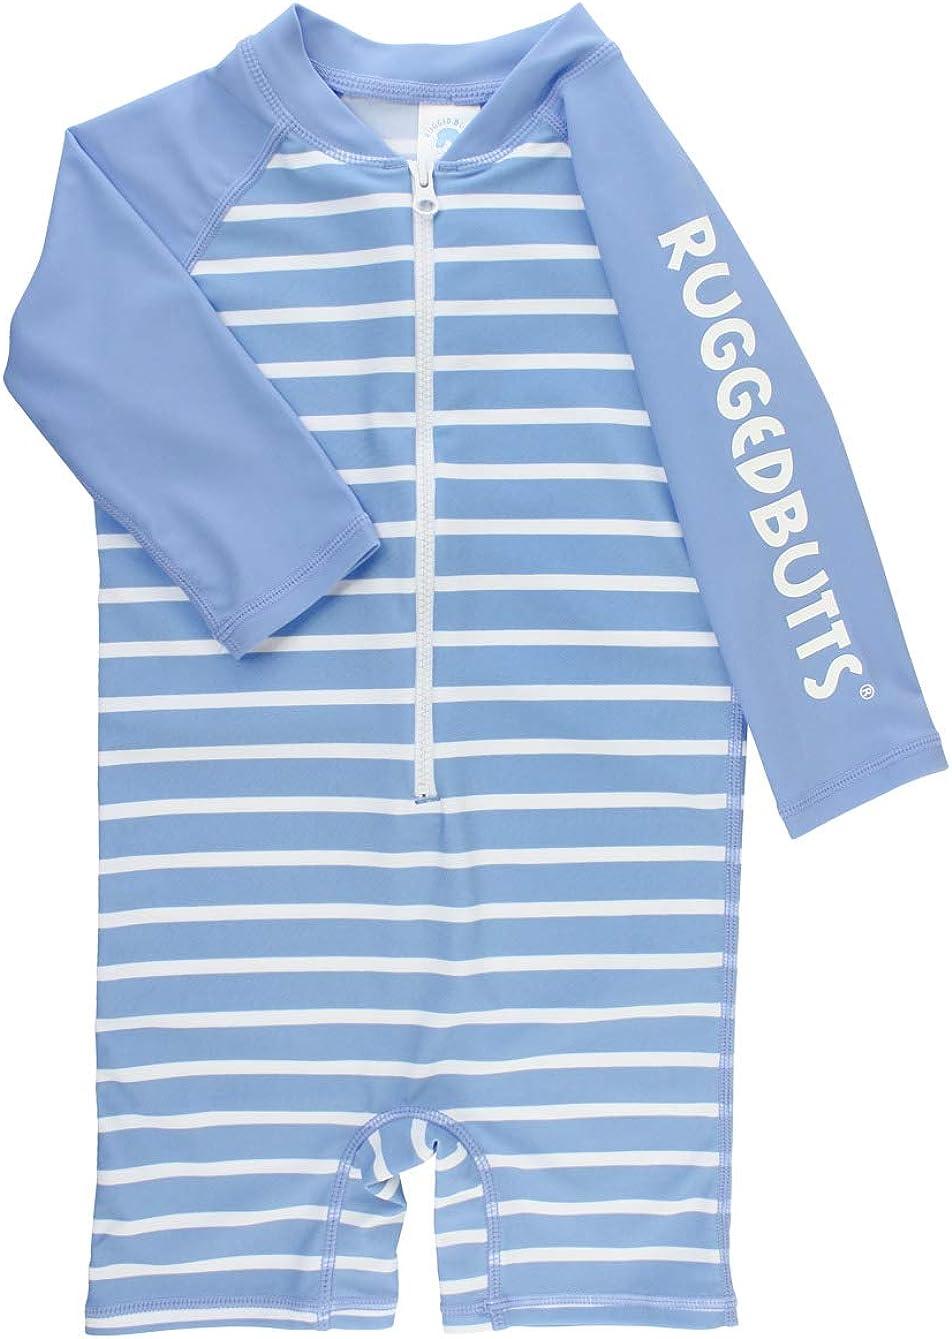 RUGGEDBUTTS Baby Credence Toddler 5 popular Boys Striped Gu One Rash Piece Swimsuit